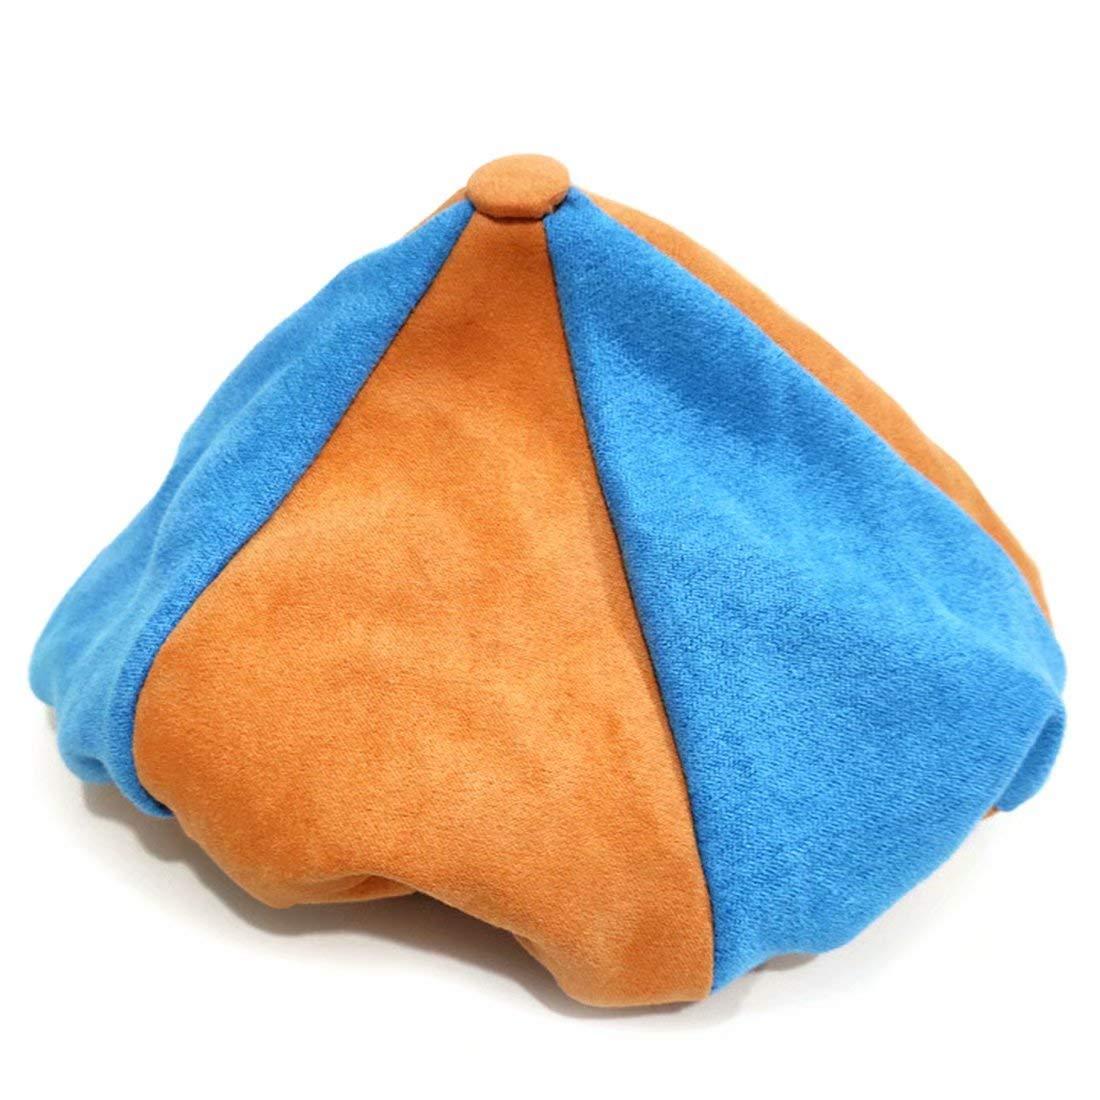 Blippi Hat, Orange Blippi Cap, Birthday Party Cosplay Prop for Unisex Children Kids